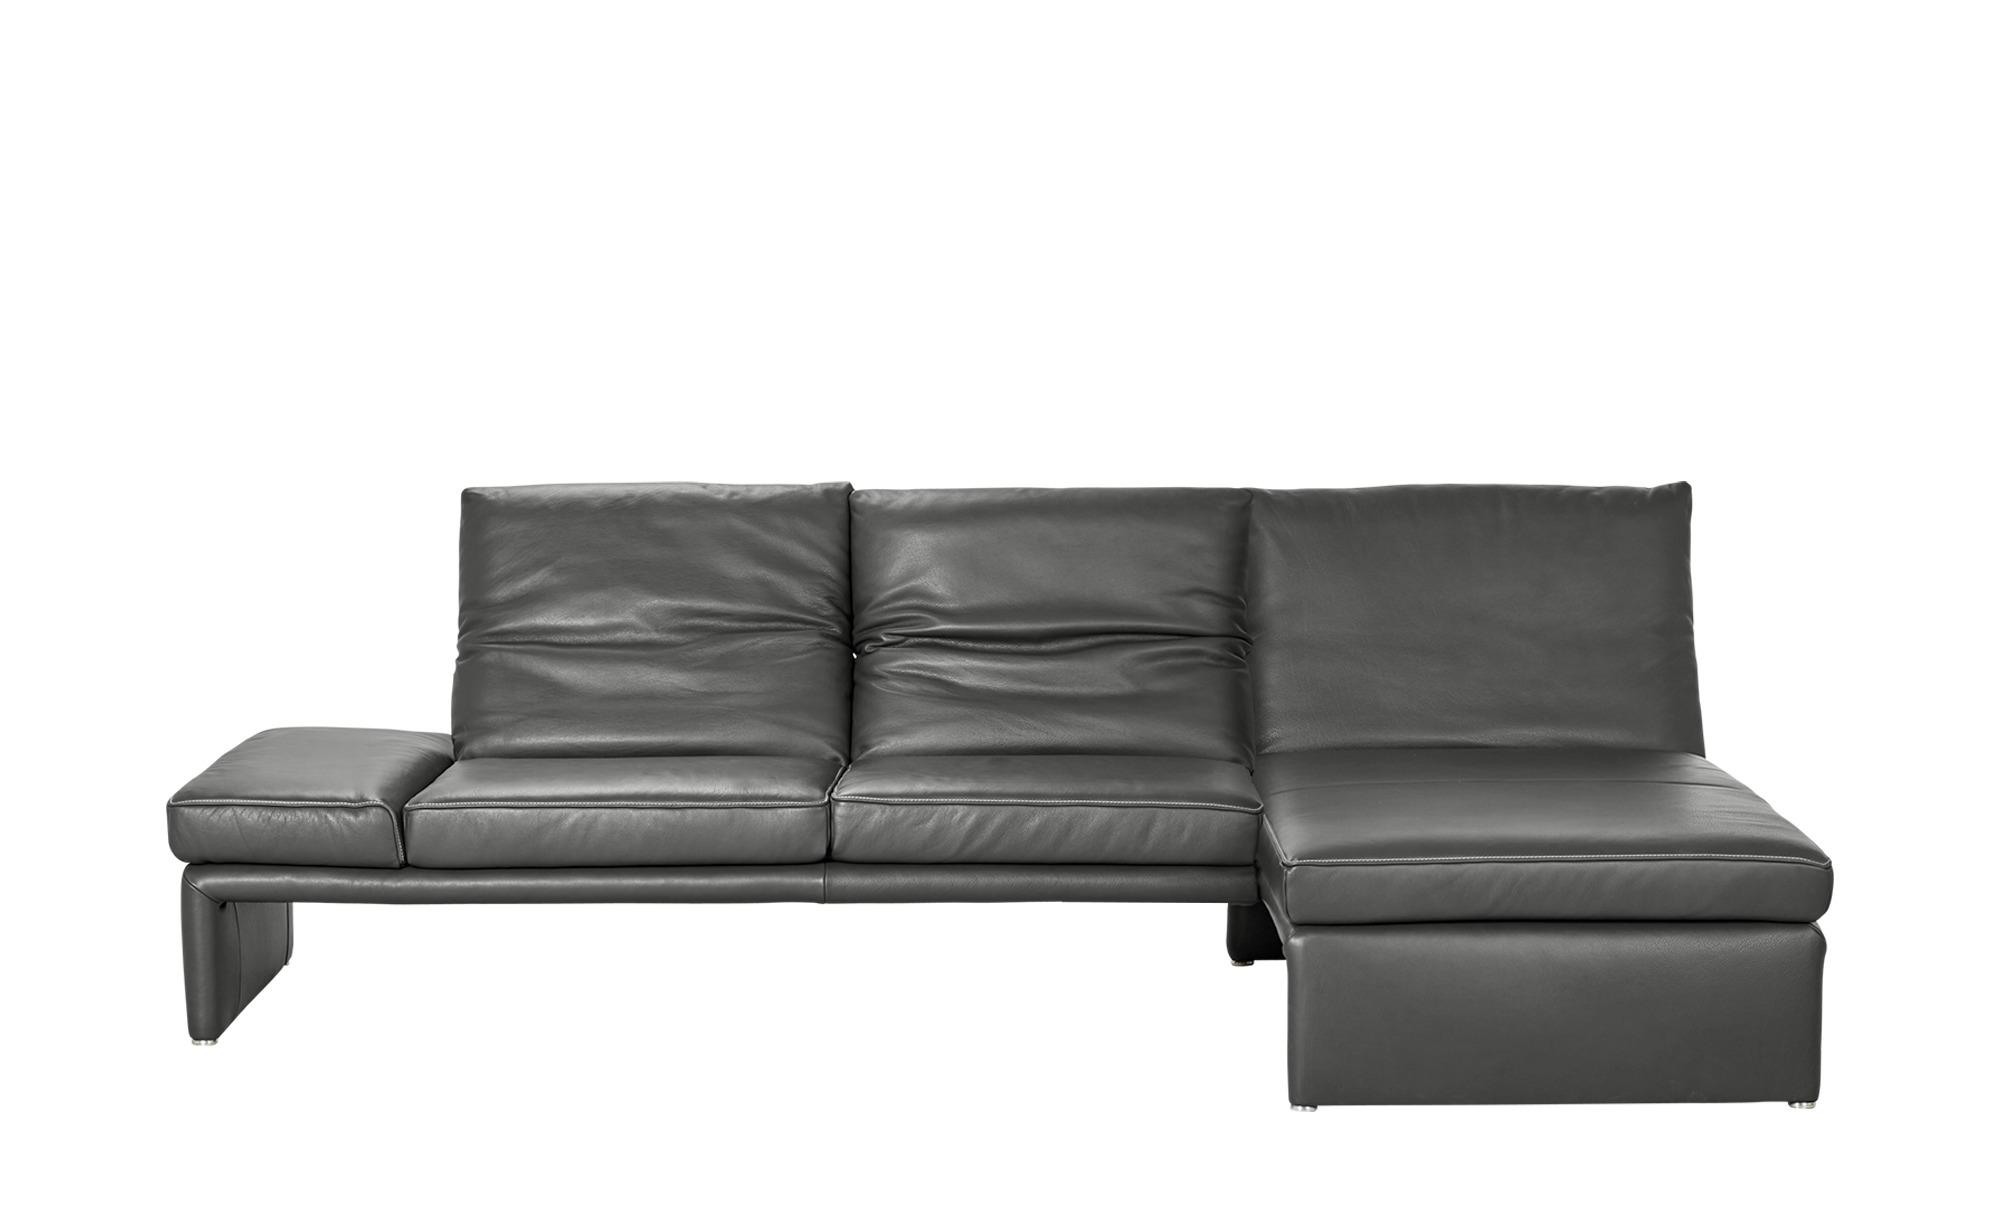 KOINOR Design-Couch  Raoul ¦ grau ¦ Maße (cm): H: 99 Polstermöbel > Sofas > Ecksofas - Höffner